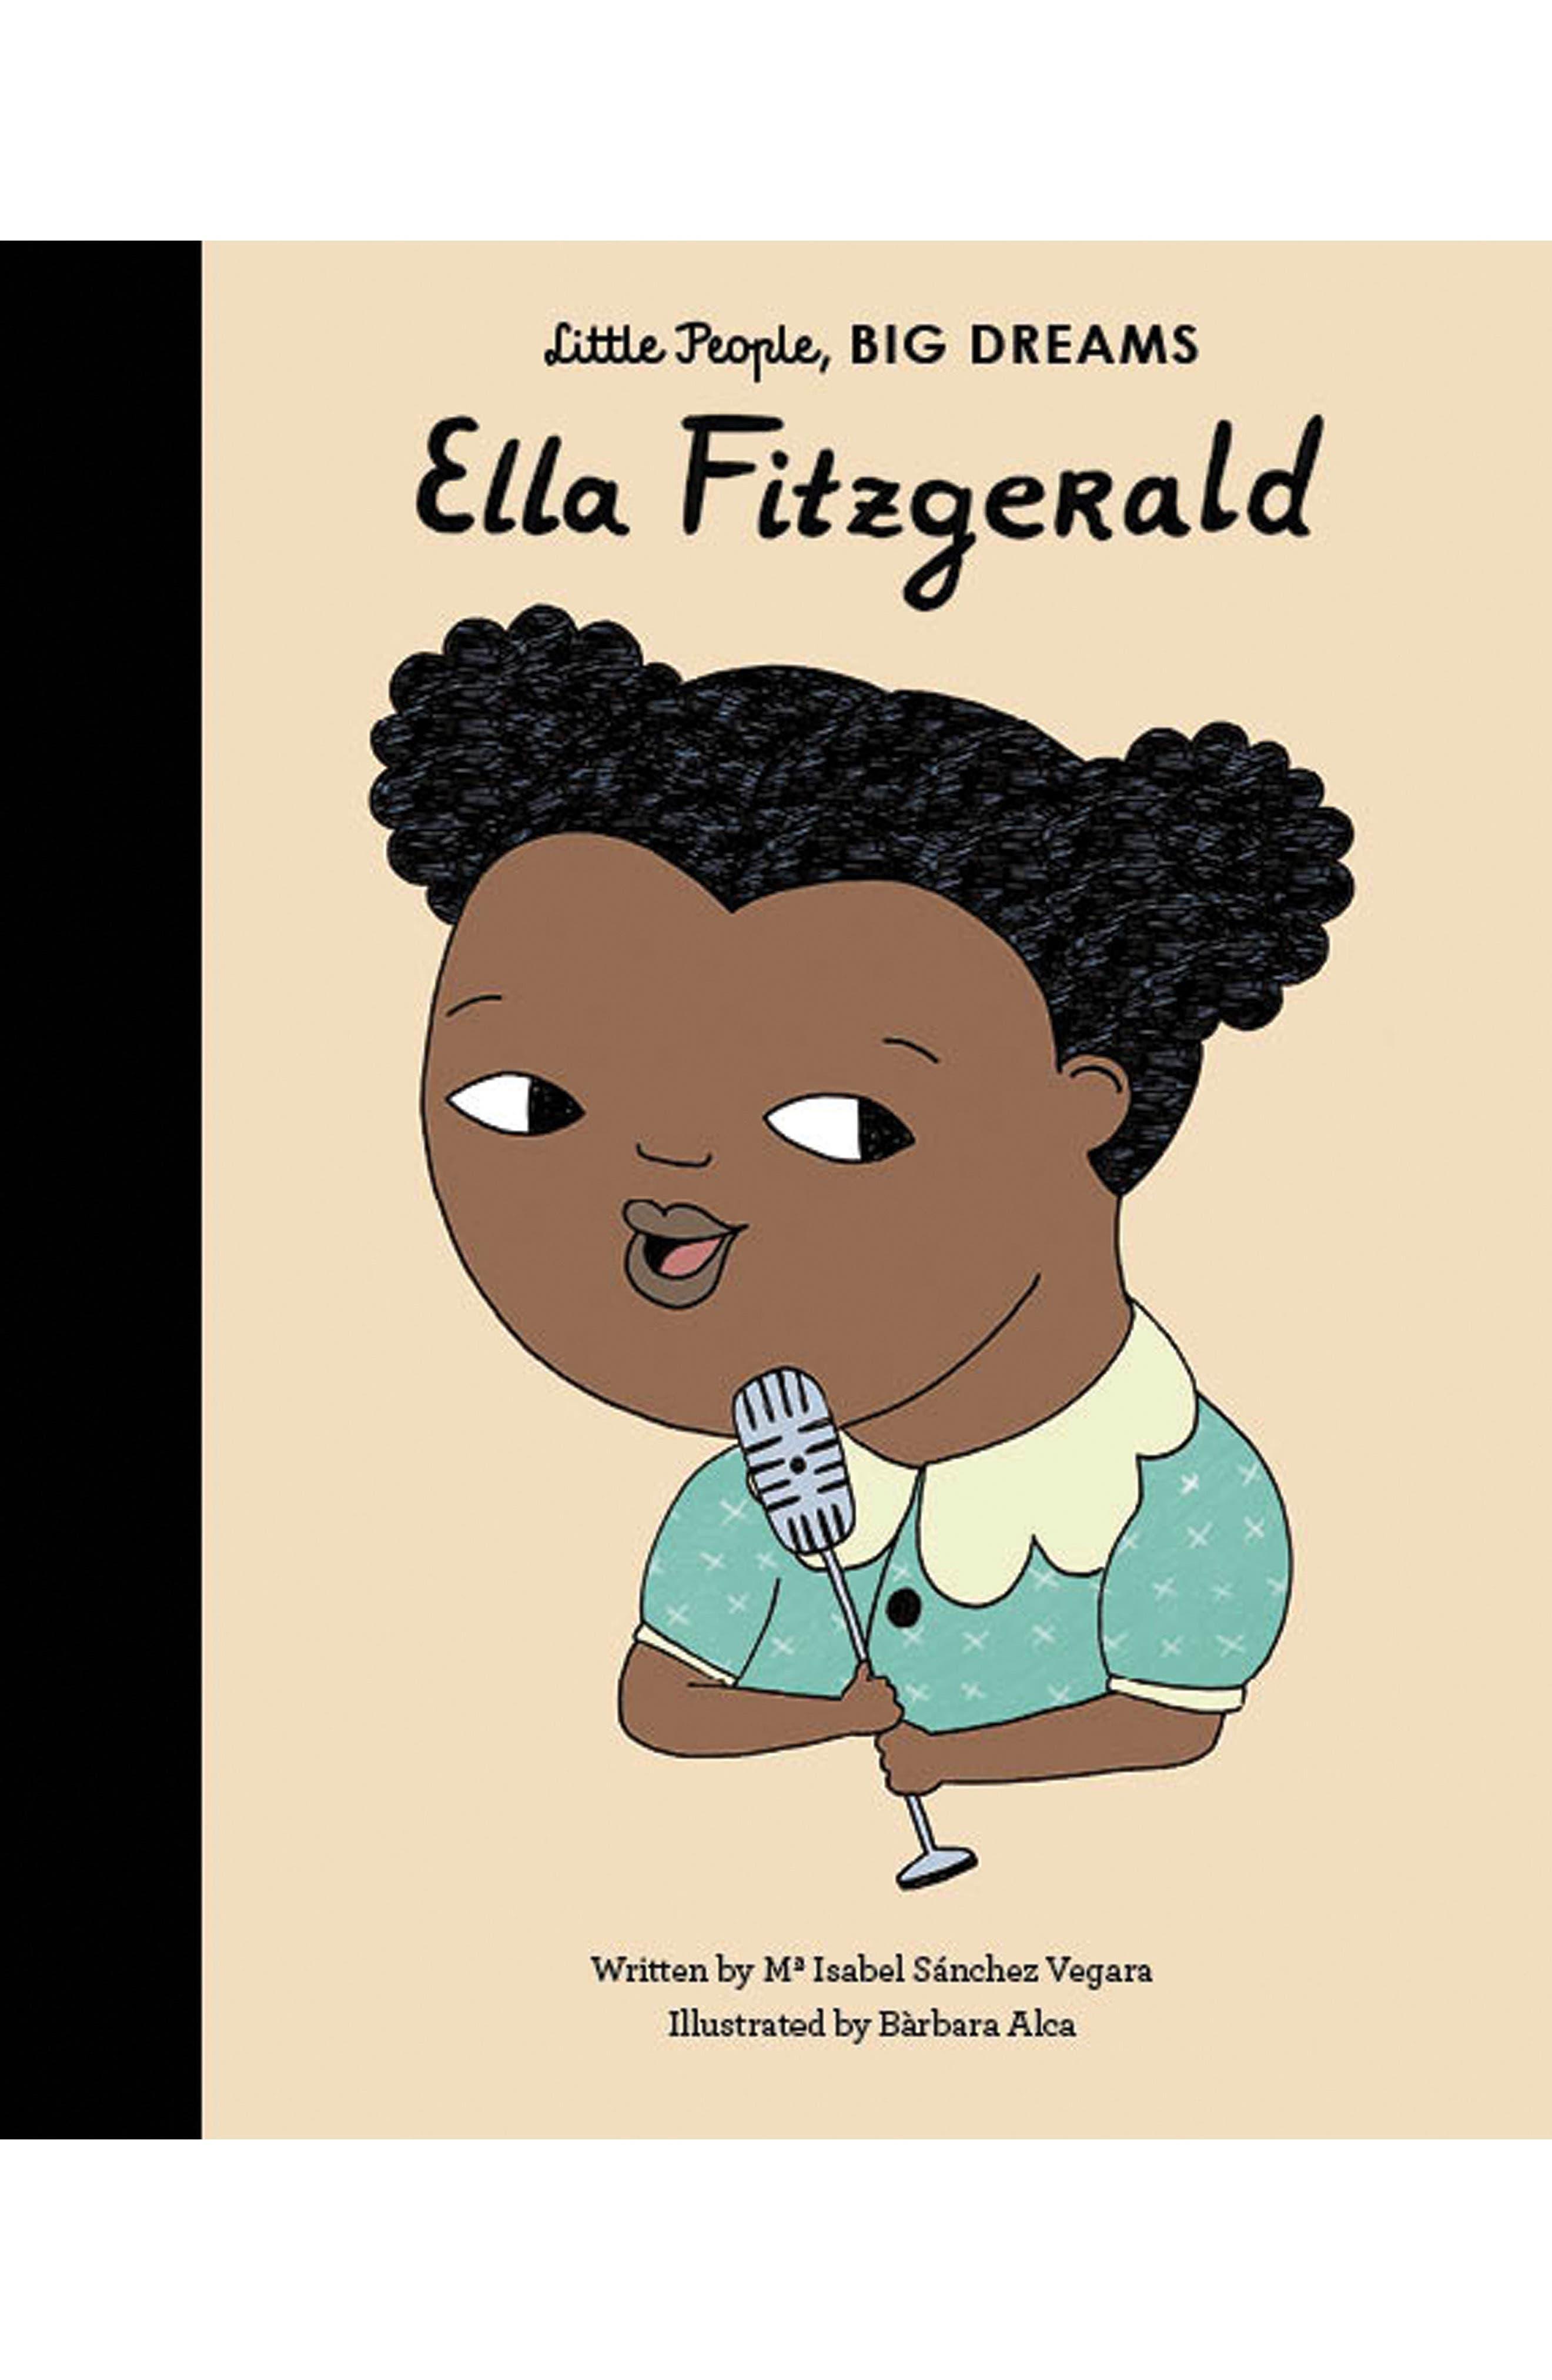 Little People, Big Dreams - Ella Fitzgerald Book